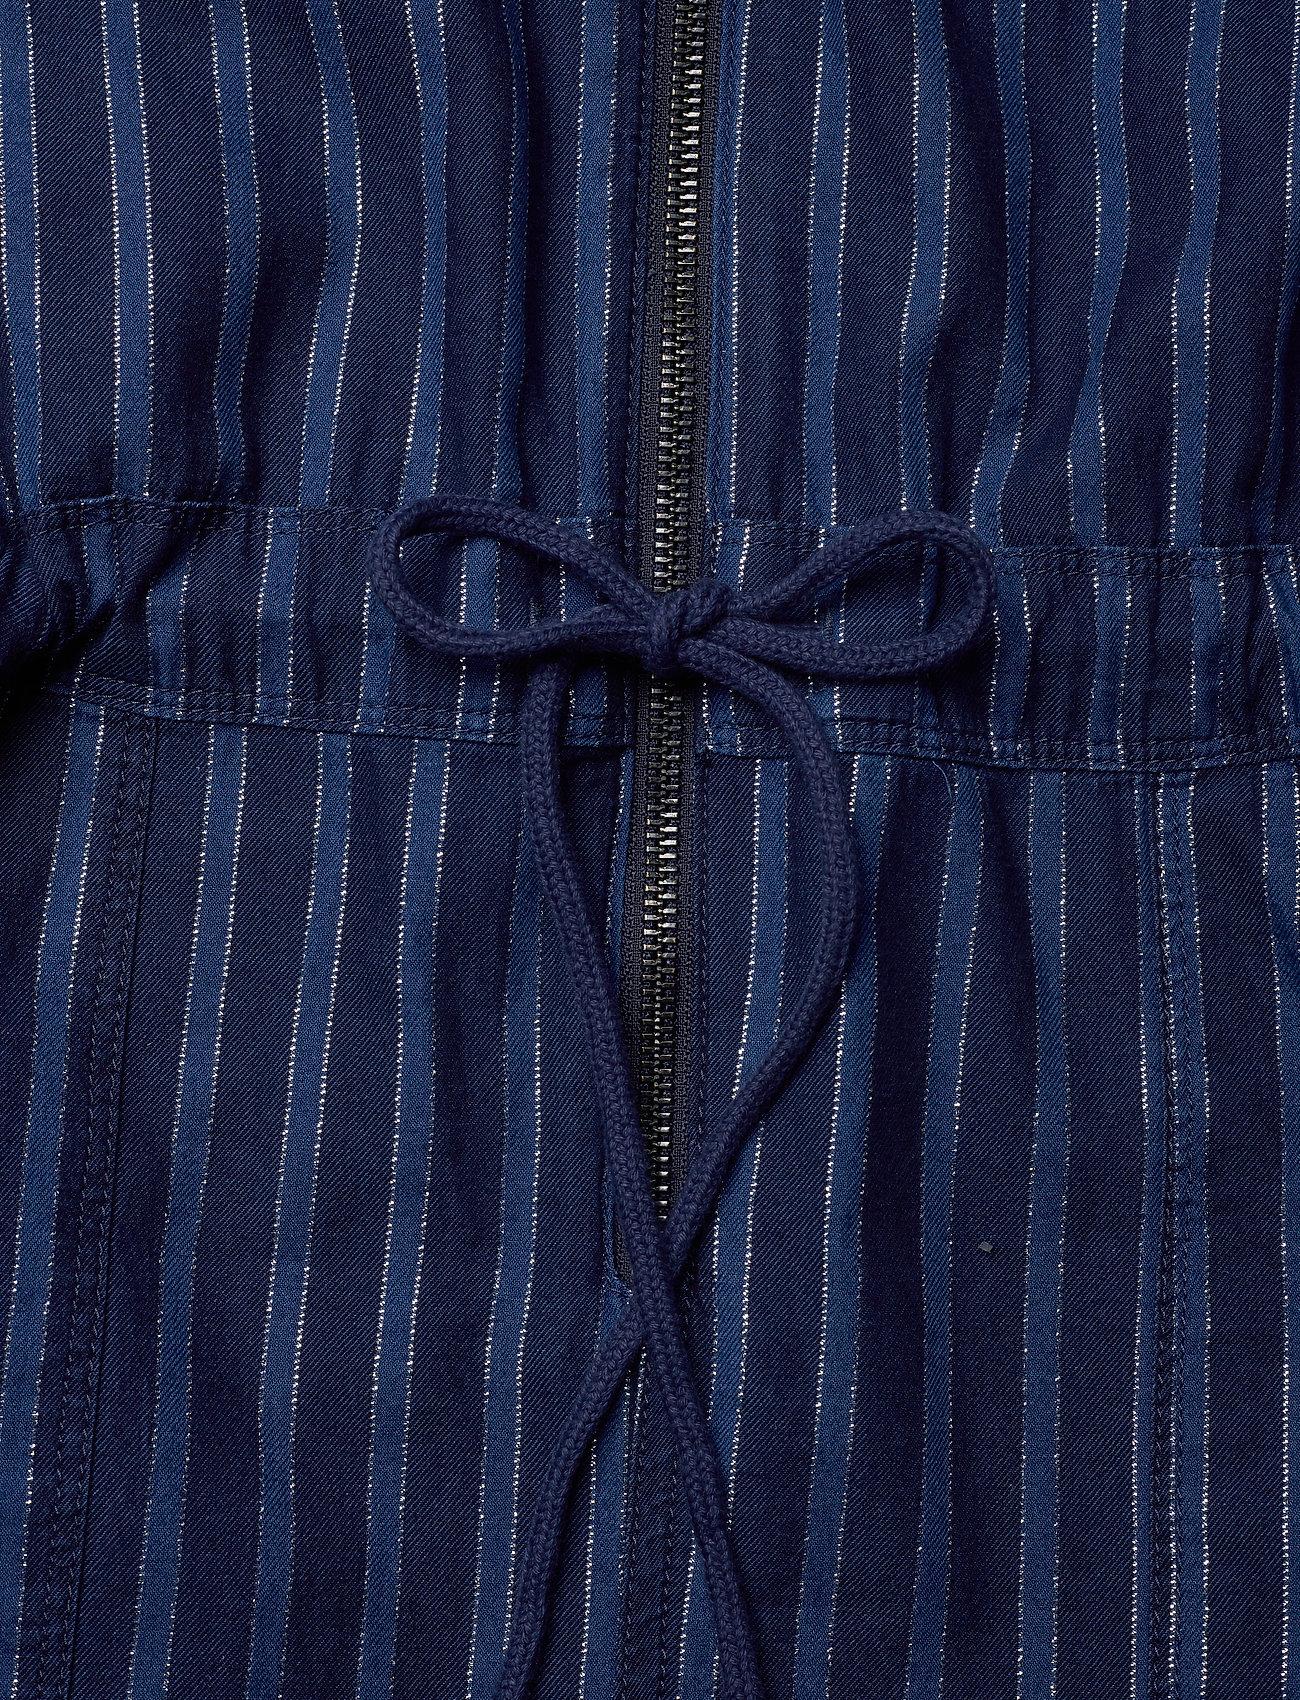 Jumpsuit (Washed Blue) (97.46 €) - Lee Jeans Xd98p